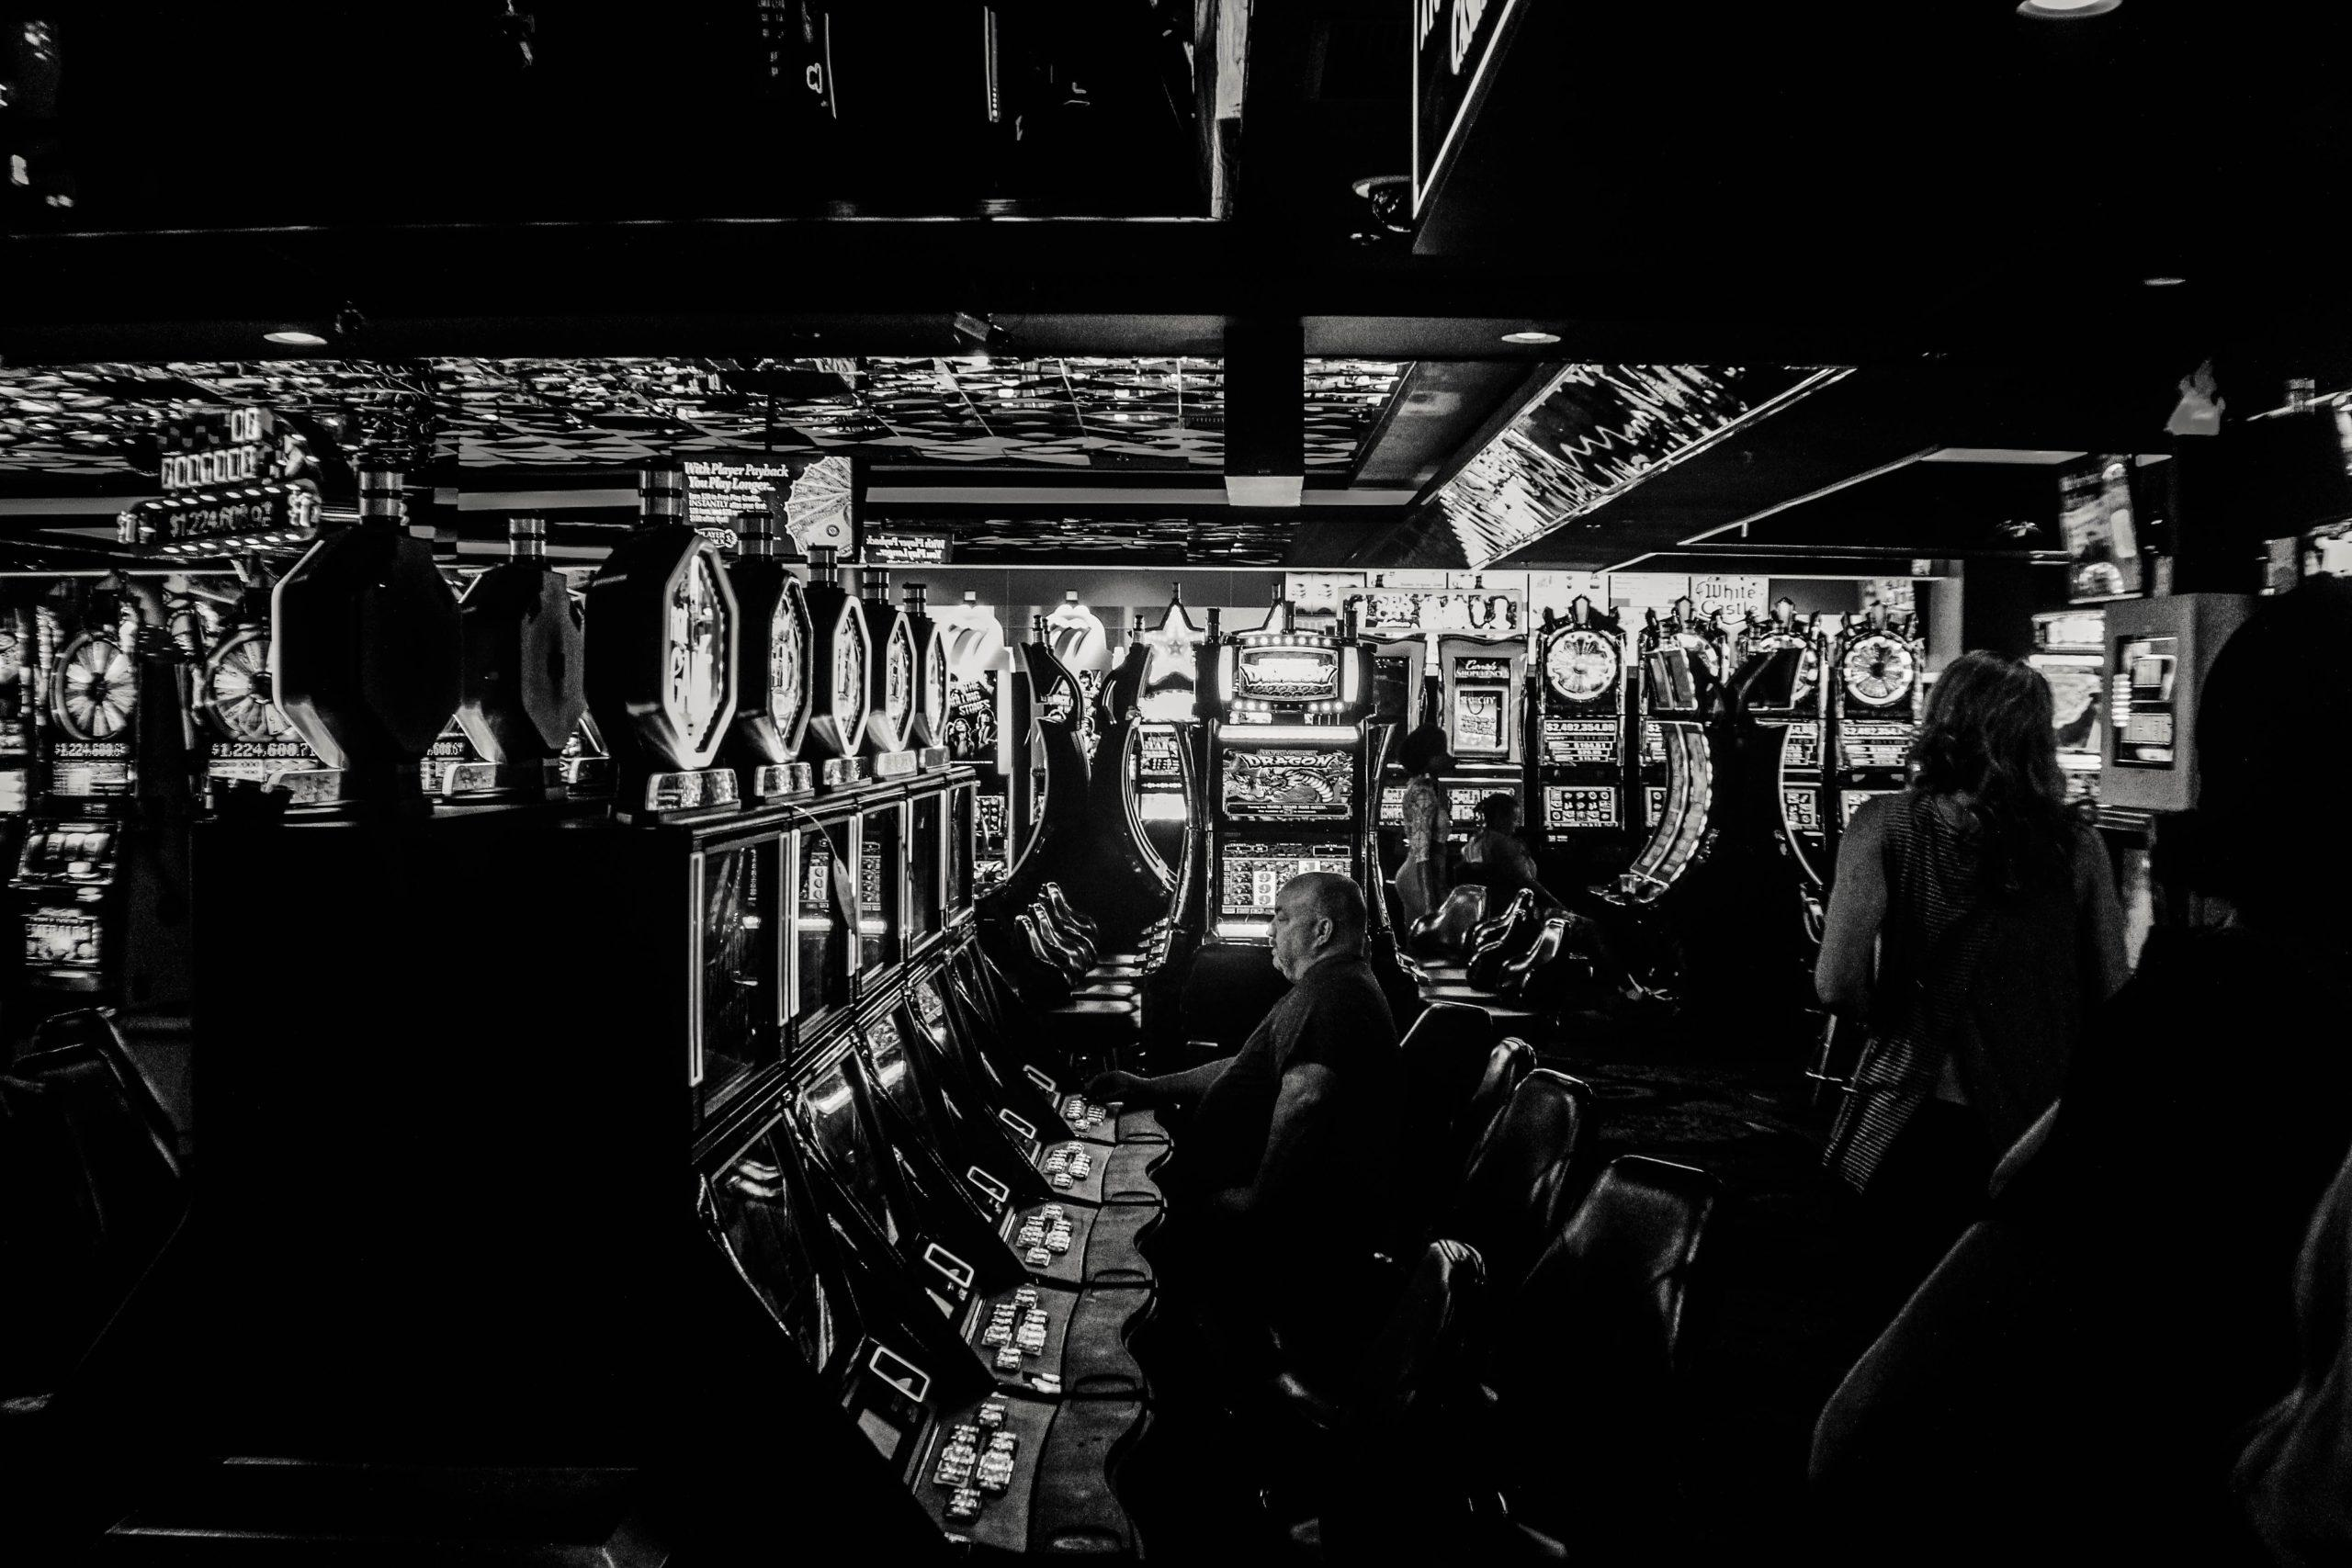 Det bedste starburst free spins casino 2020